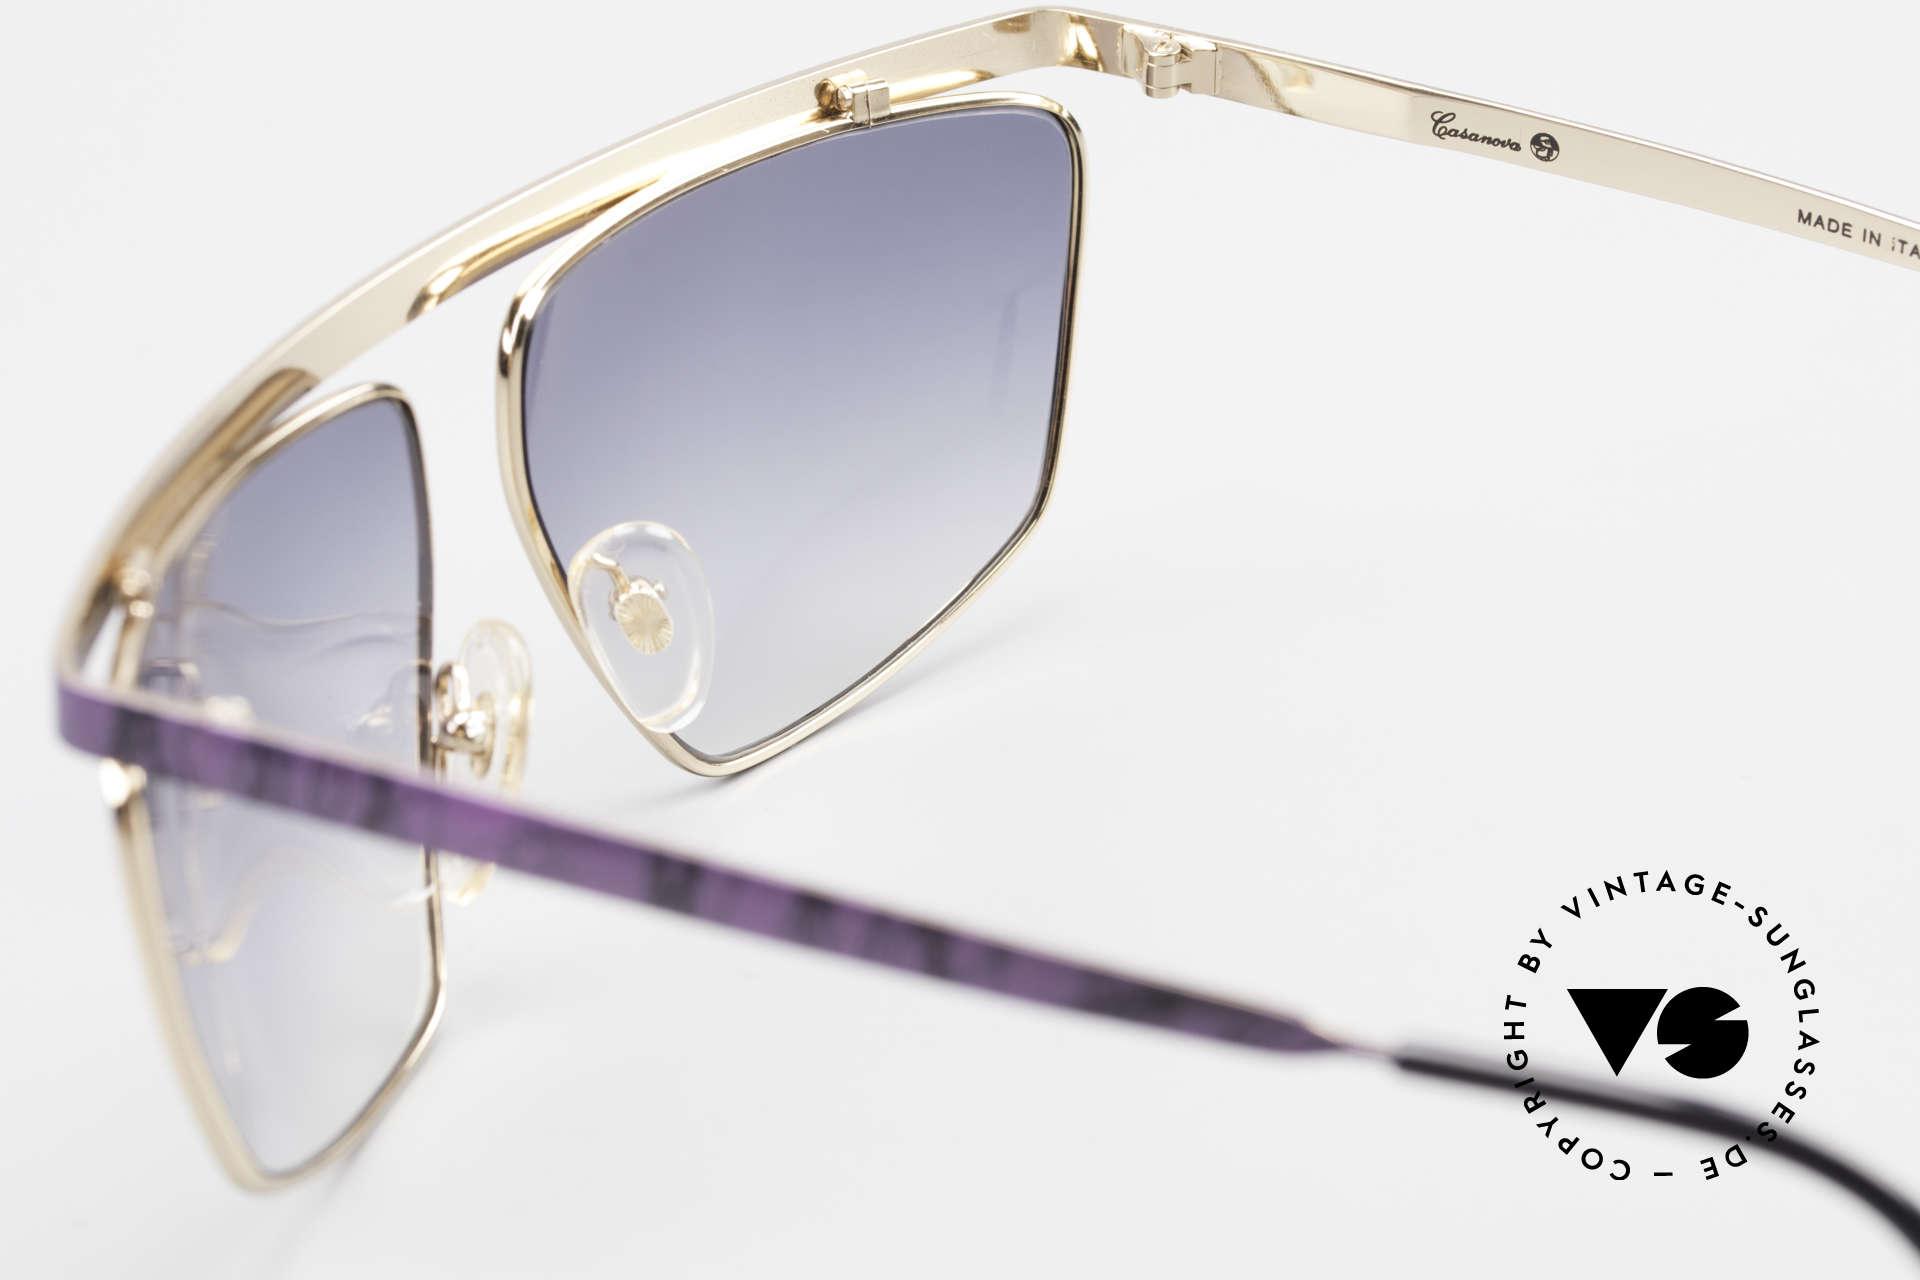 Casanova CN7 Gold-Plated Luxury Sunglasses, Casanova: synonym for frisky & lively frame designs, Made for Men and Women